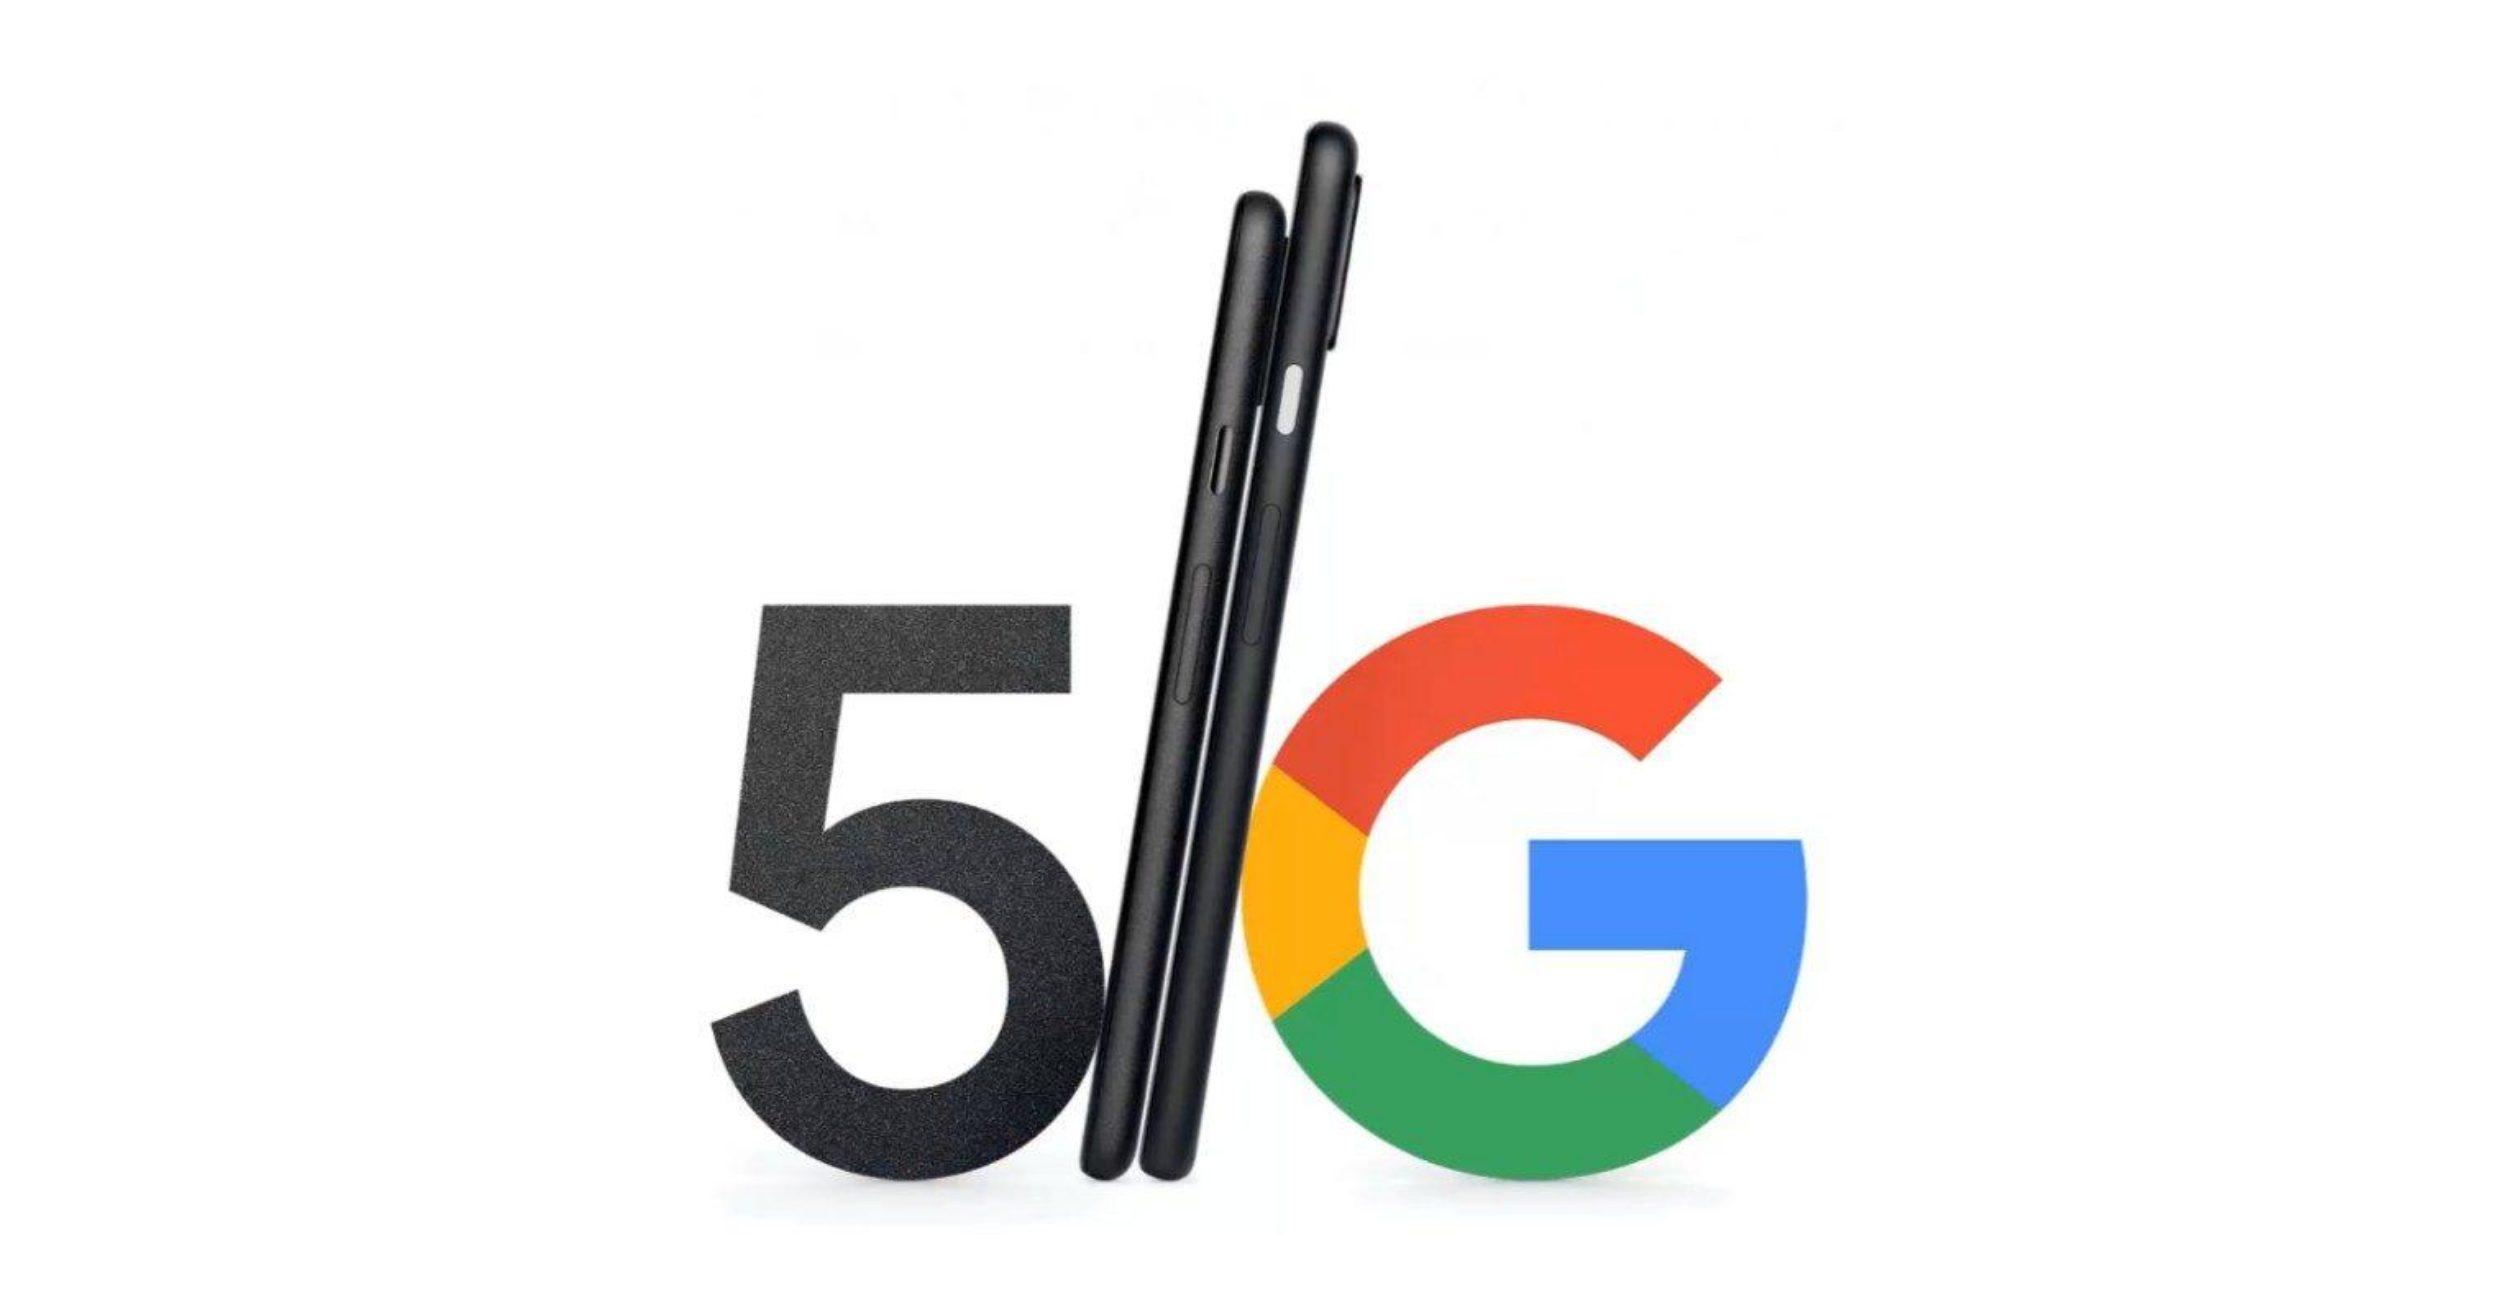 benchmark-confirms-google-pixel-5-sporting-snapdragon-765g-image-1